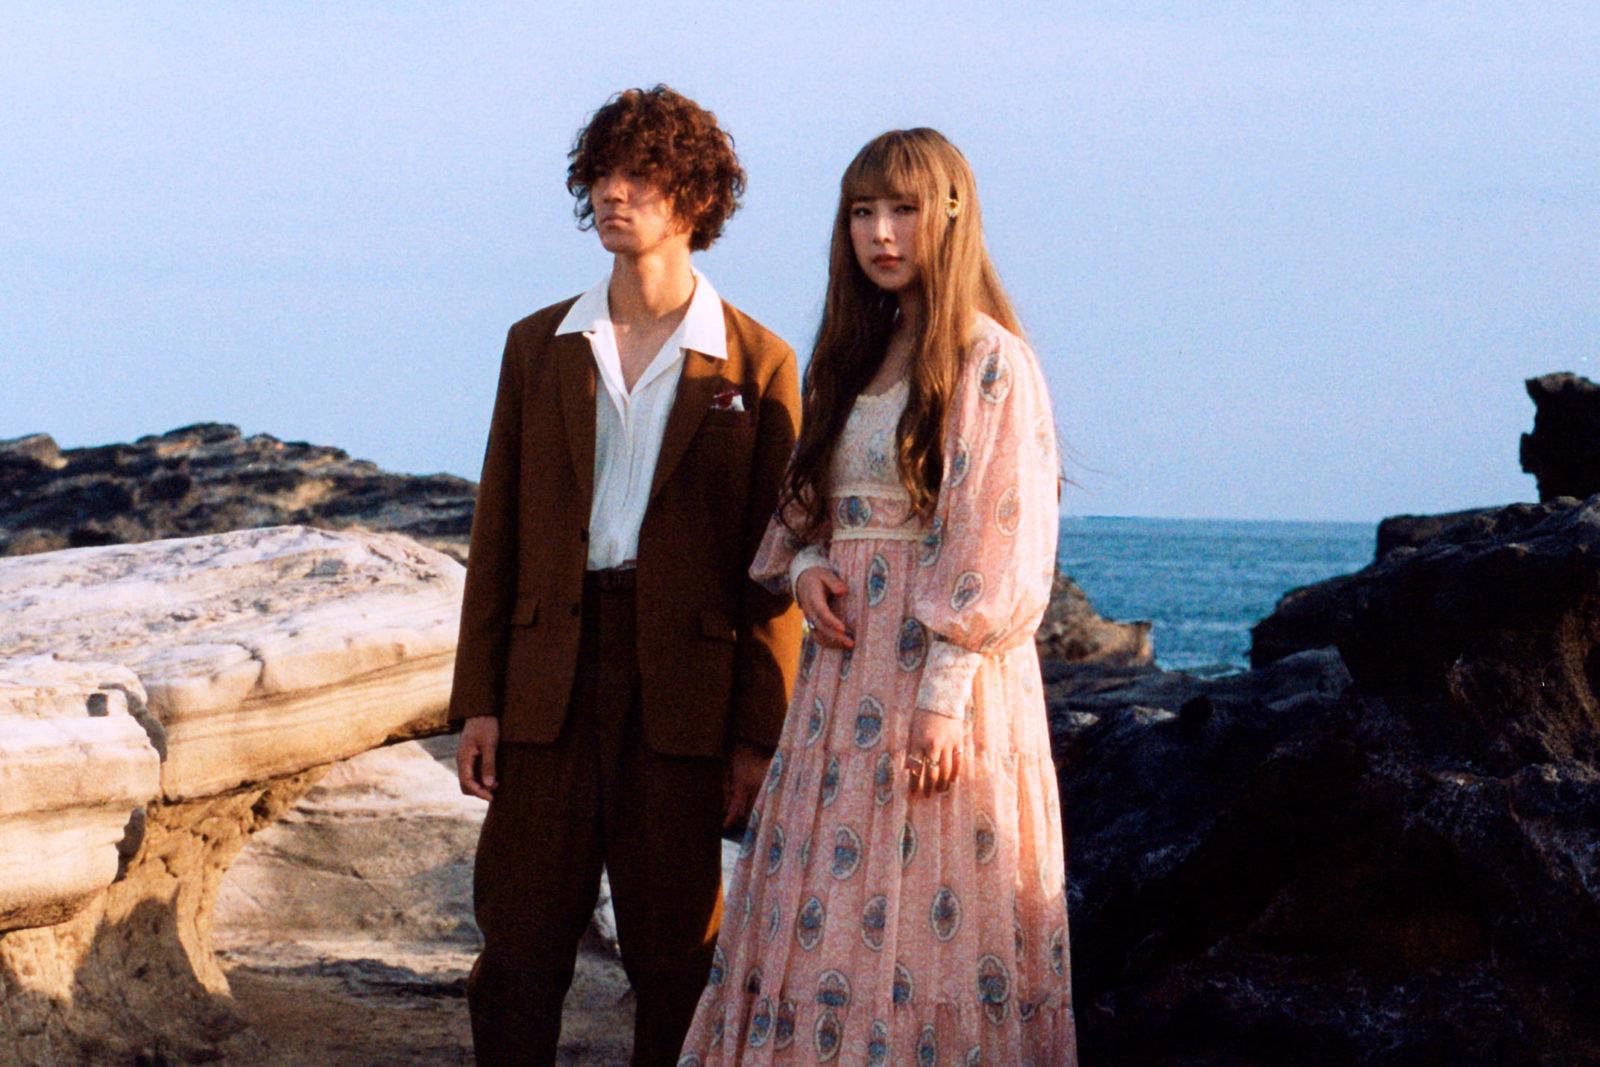 GLIM SPANKY、新曲「By Myself Again」が10月公開の映画『実りゆく』主題歌に決定サムネイル画像